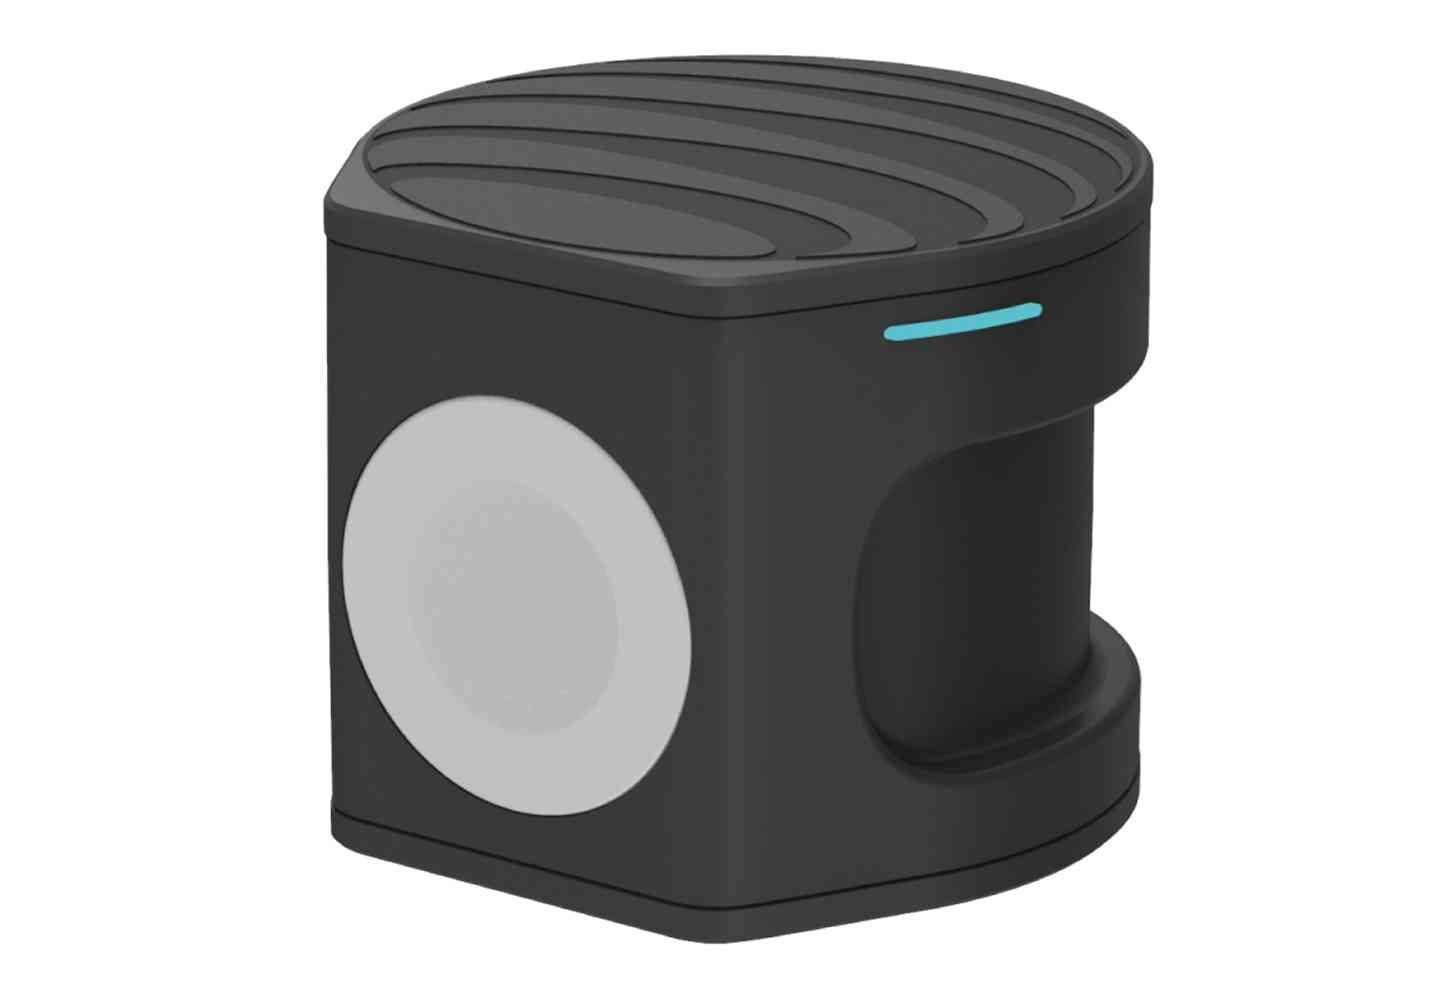 AT&T Power Drum battery pack leak